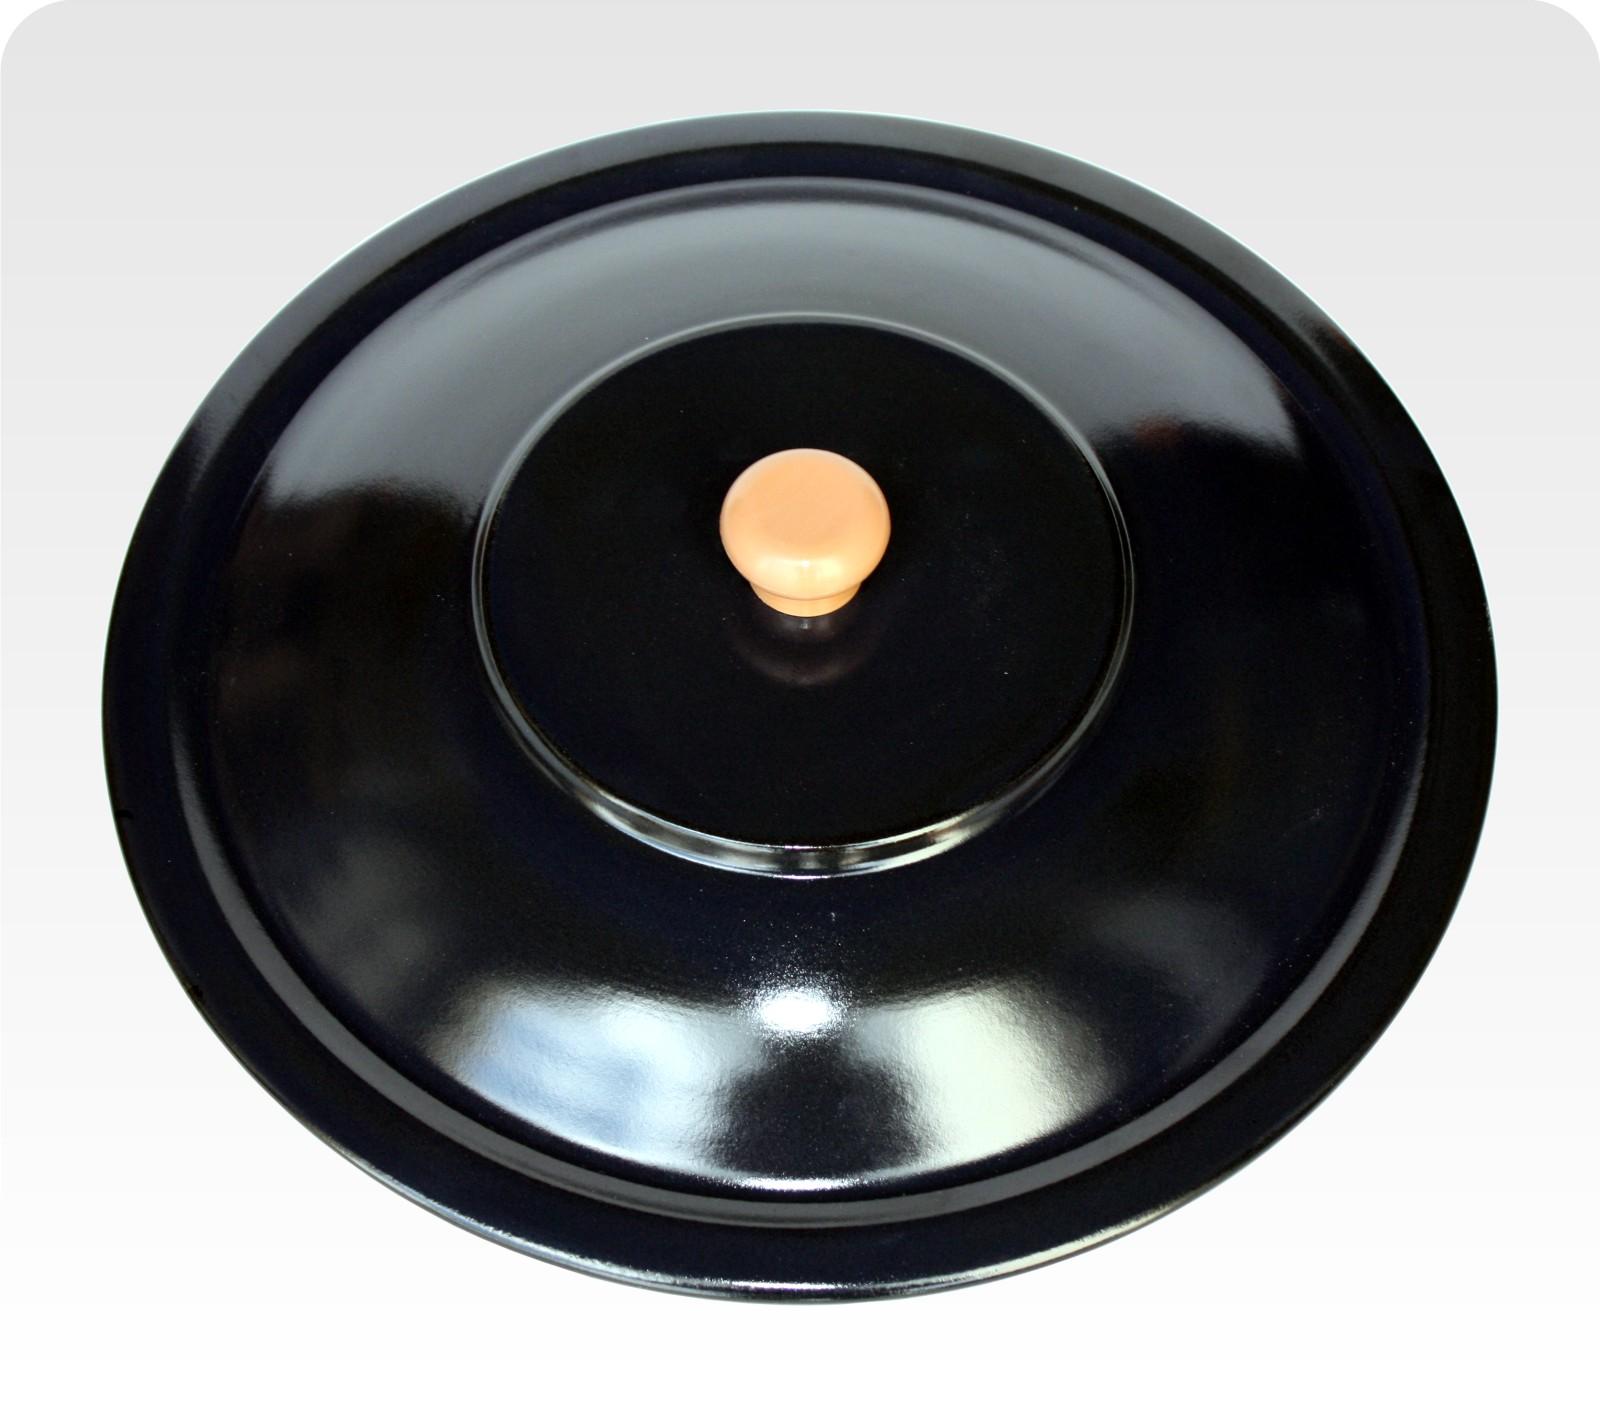 50l gulaschkessel emailliert deckel holzl ffel 5 rezepte 50 liter bogracs ebay. Black Bedroom Furniture Sets. Home Design Ideas